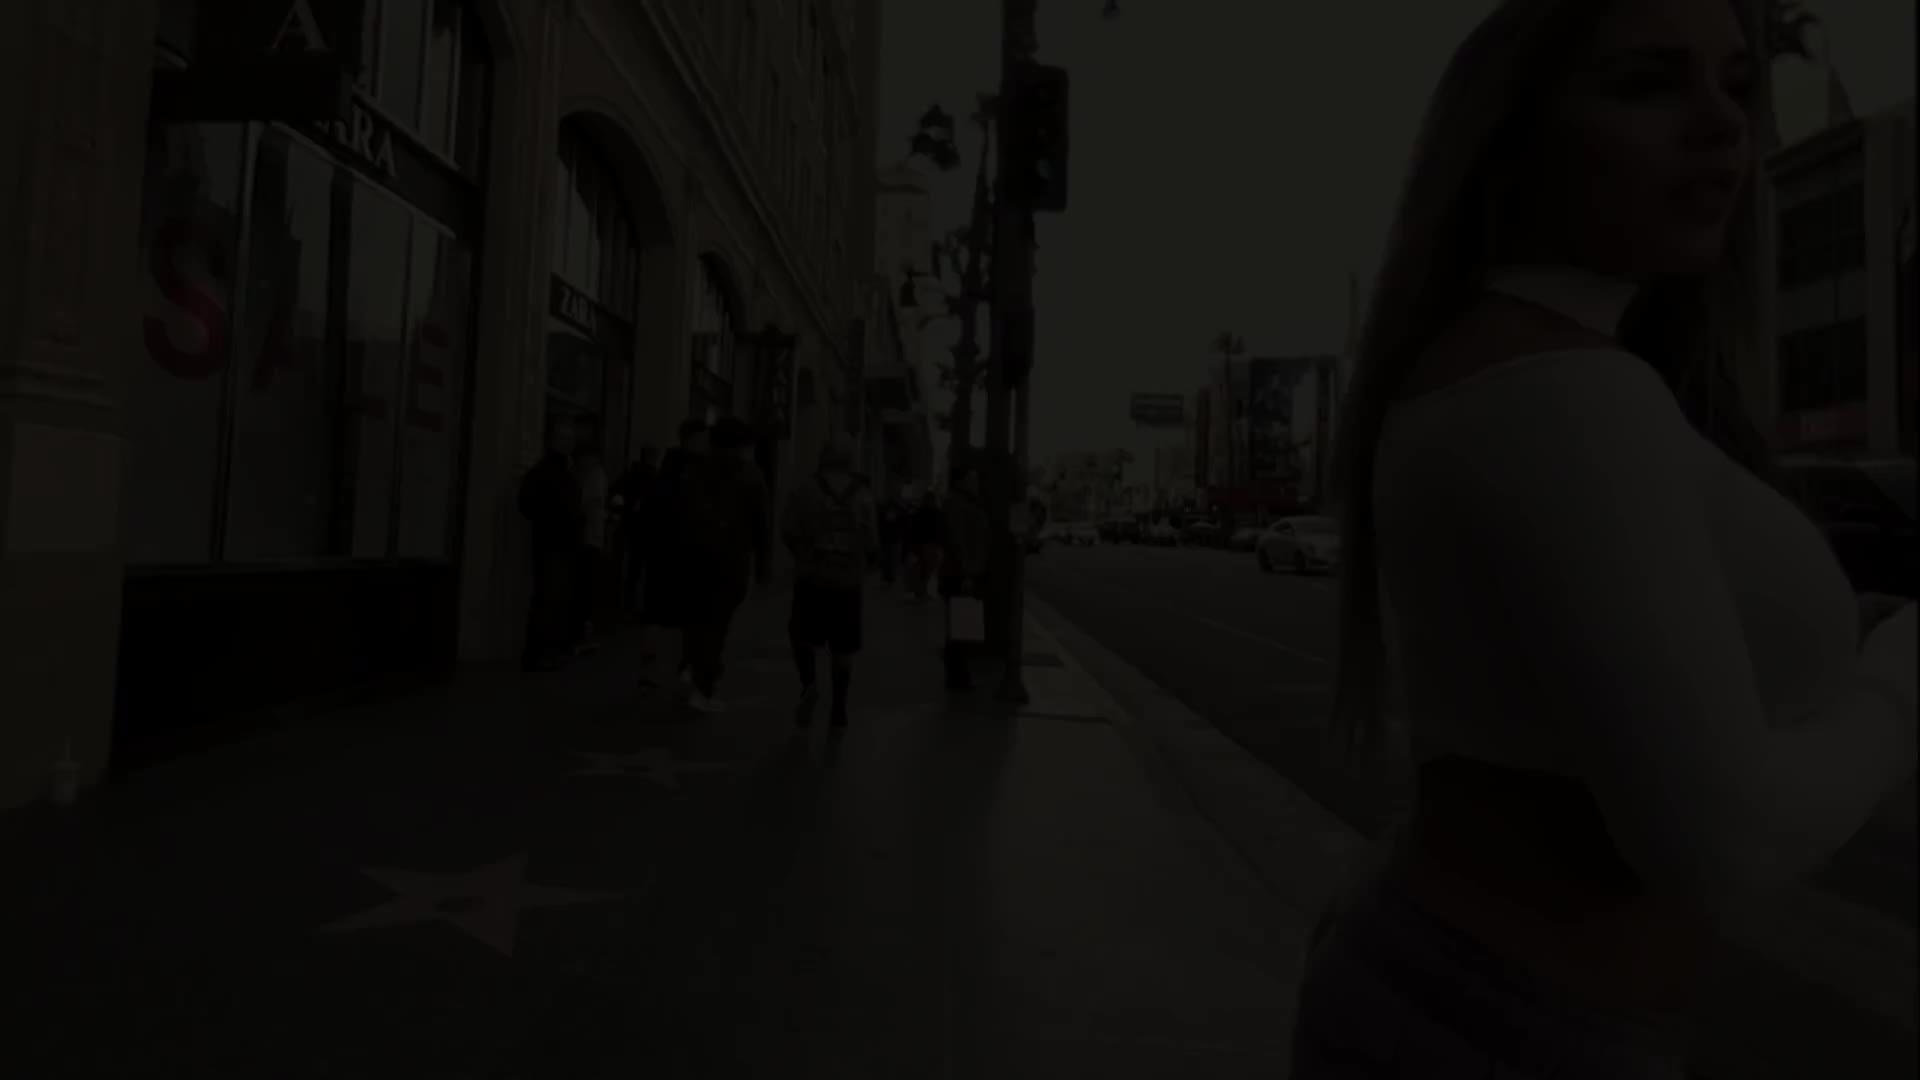 360, Music, Wingm3n, magga braco, oculus, oculus rift, vr, Oculus Rift - Magga Braco GIFs